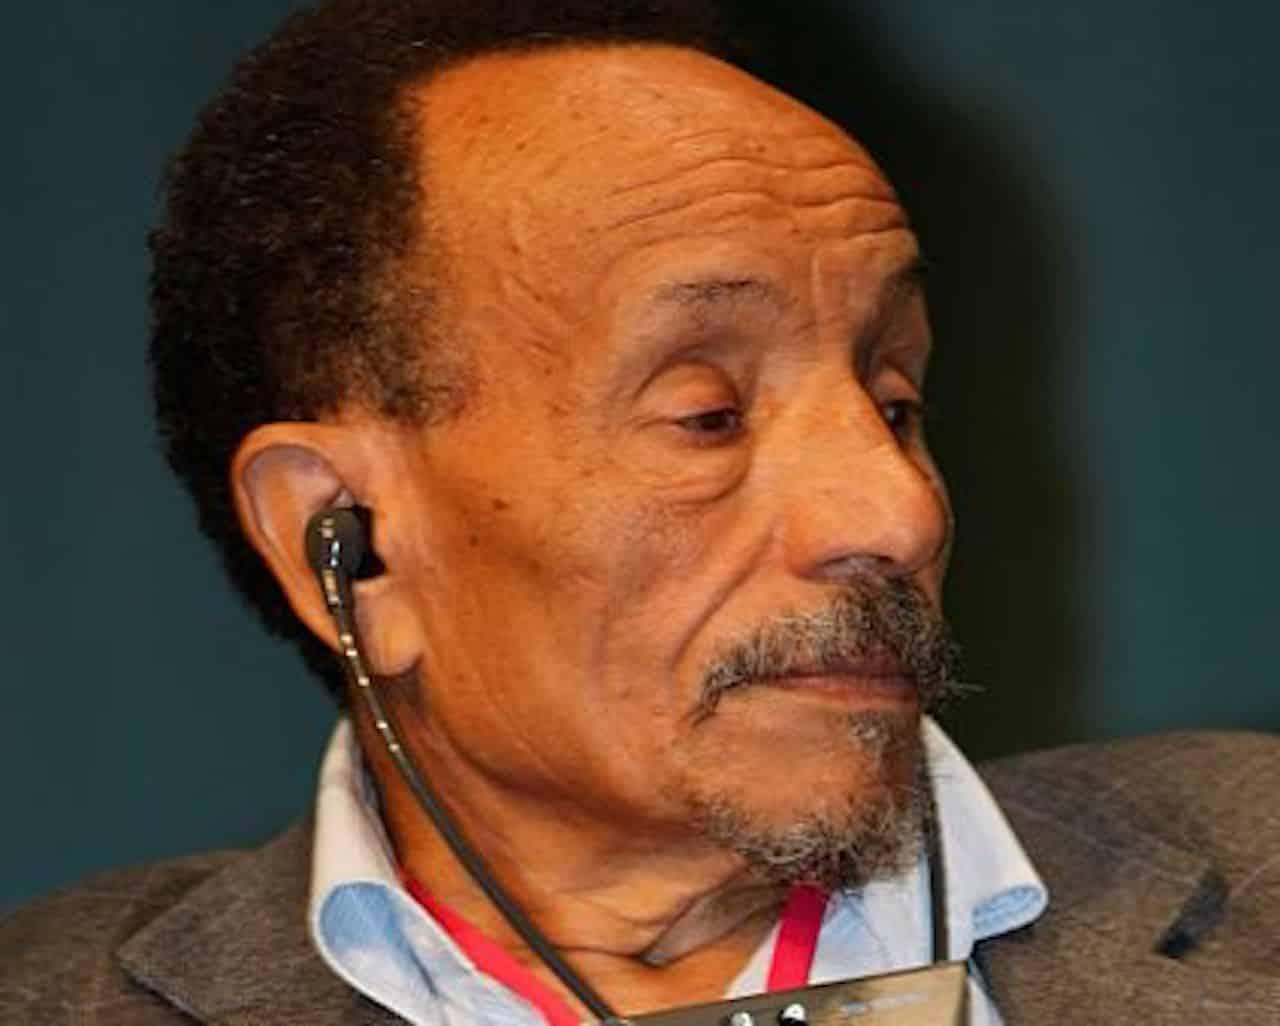 Pierre Rabhi citations